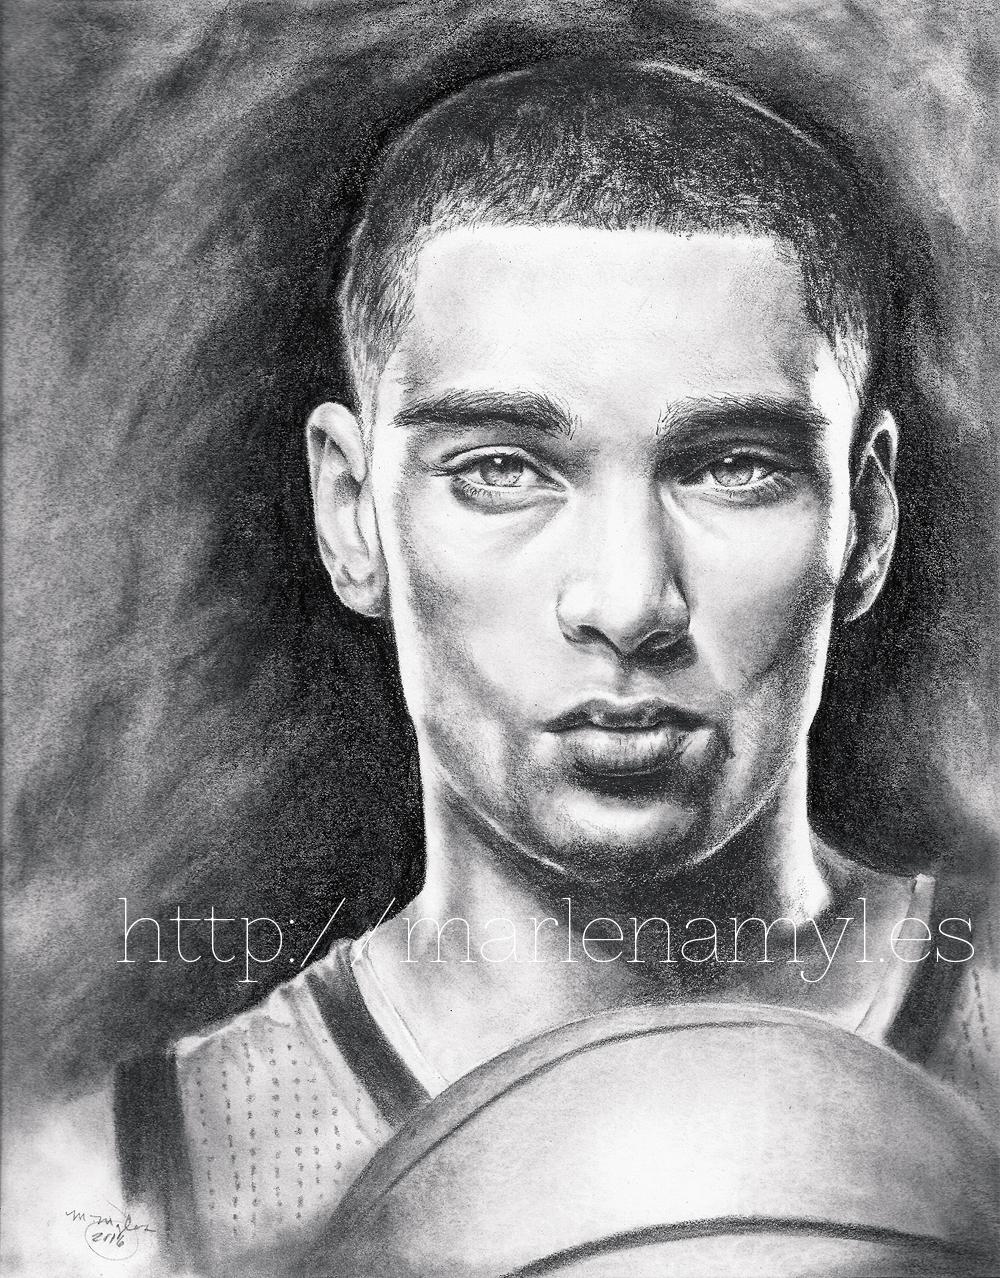 Portrait drawing of Zach LaVine